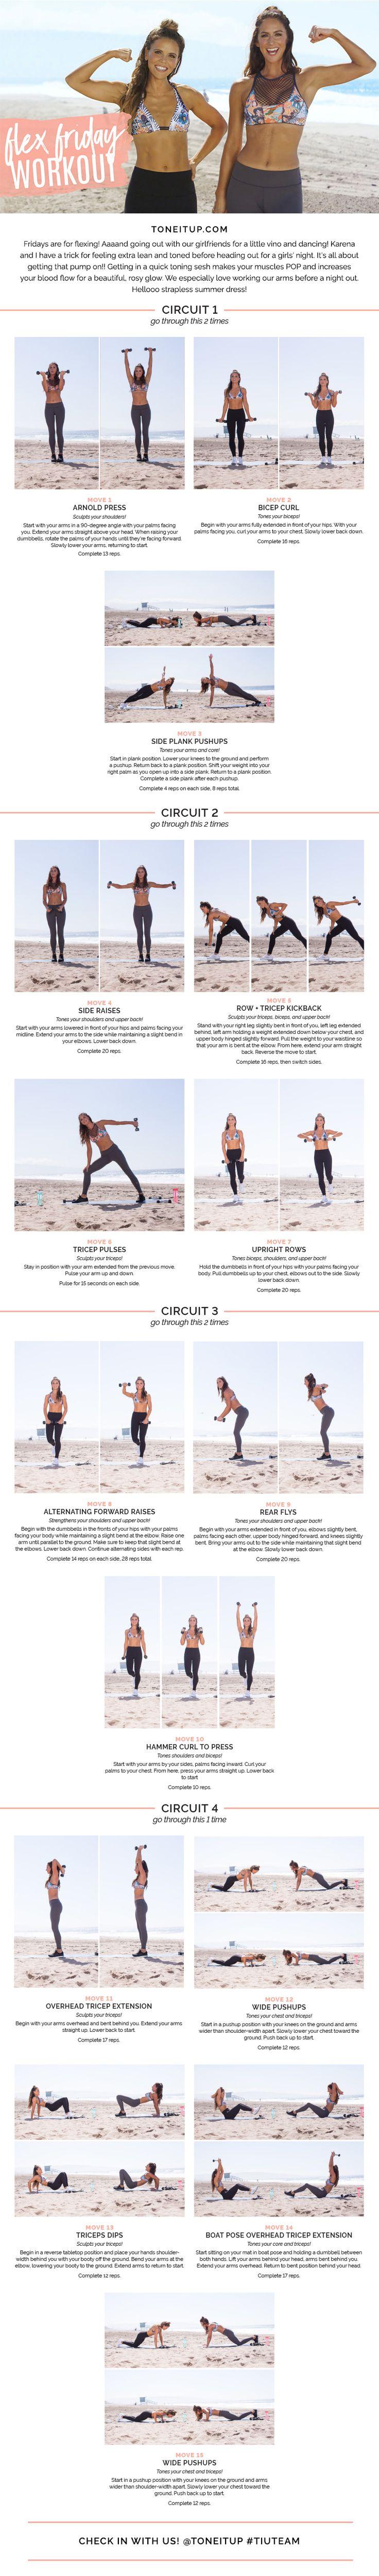 On Fridays we flex!! NEW Bikini Series Arm Workout!